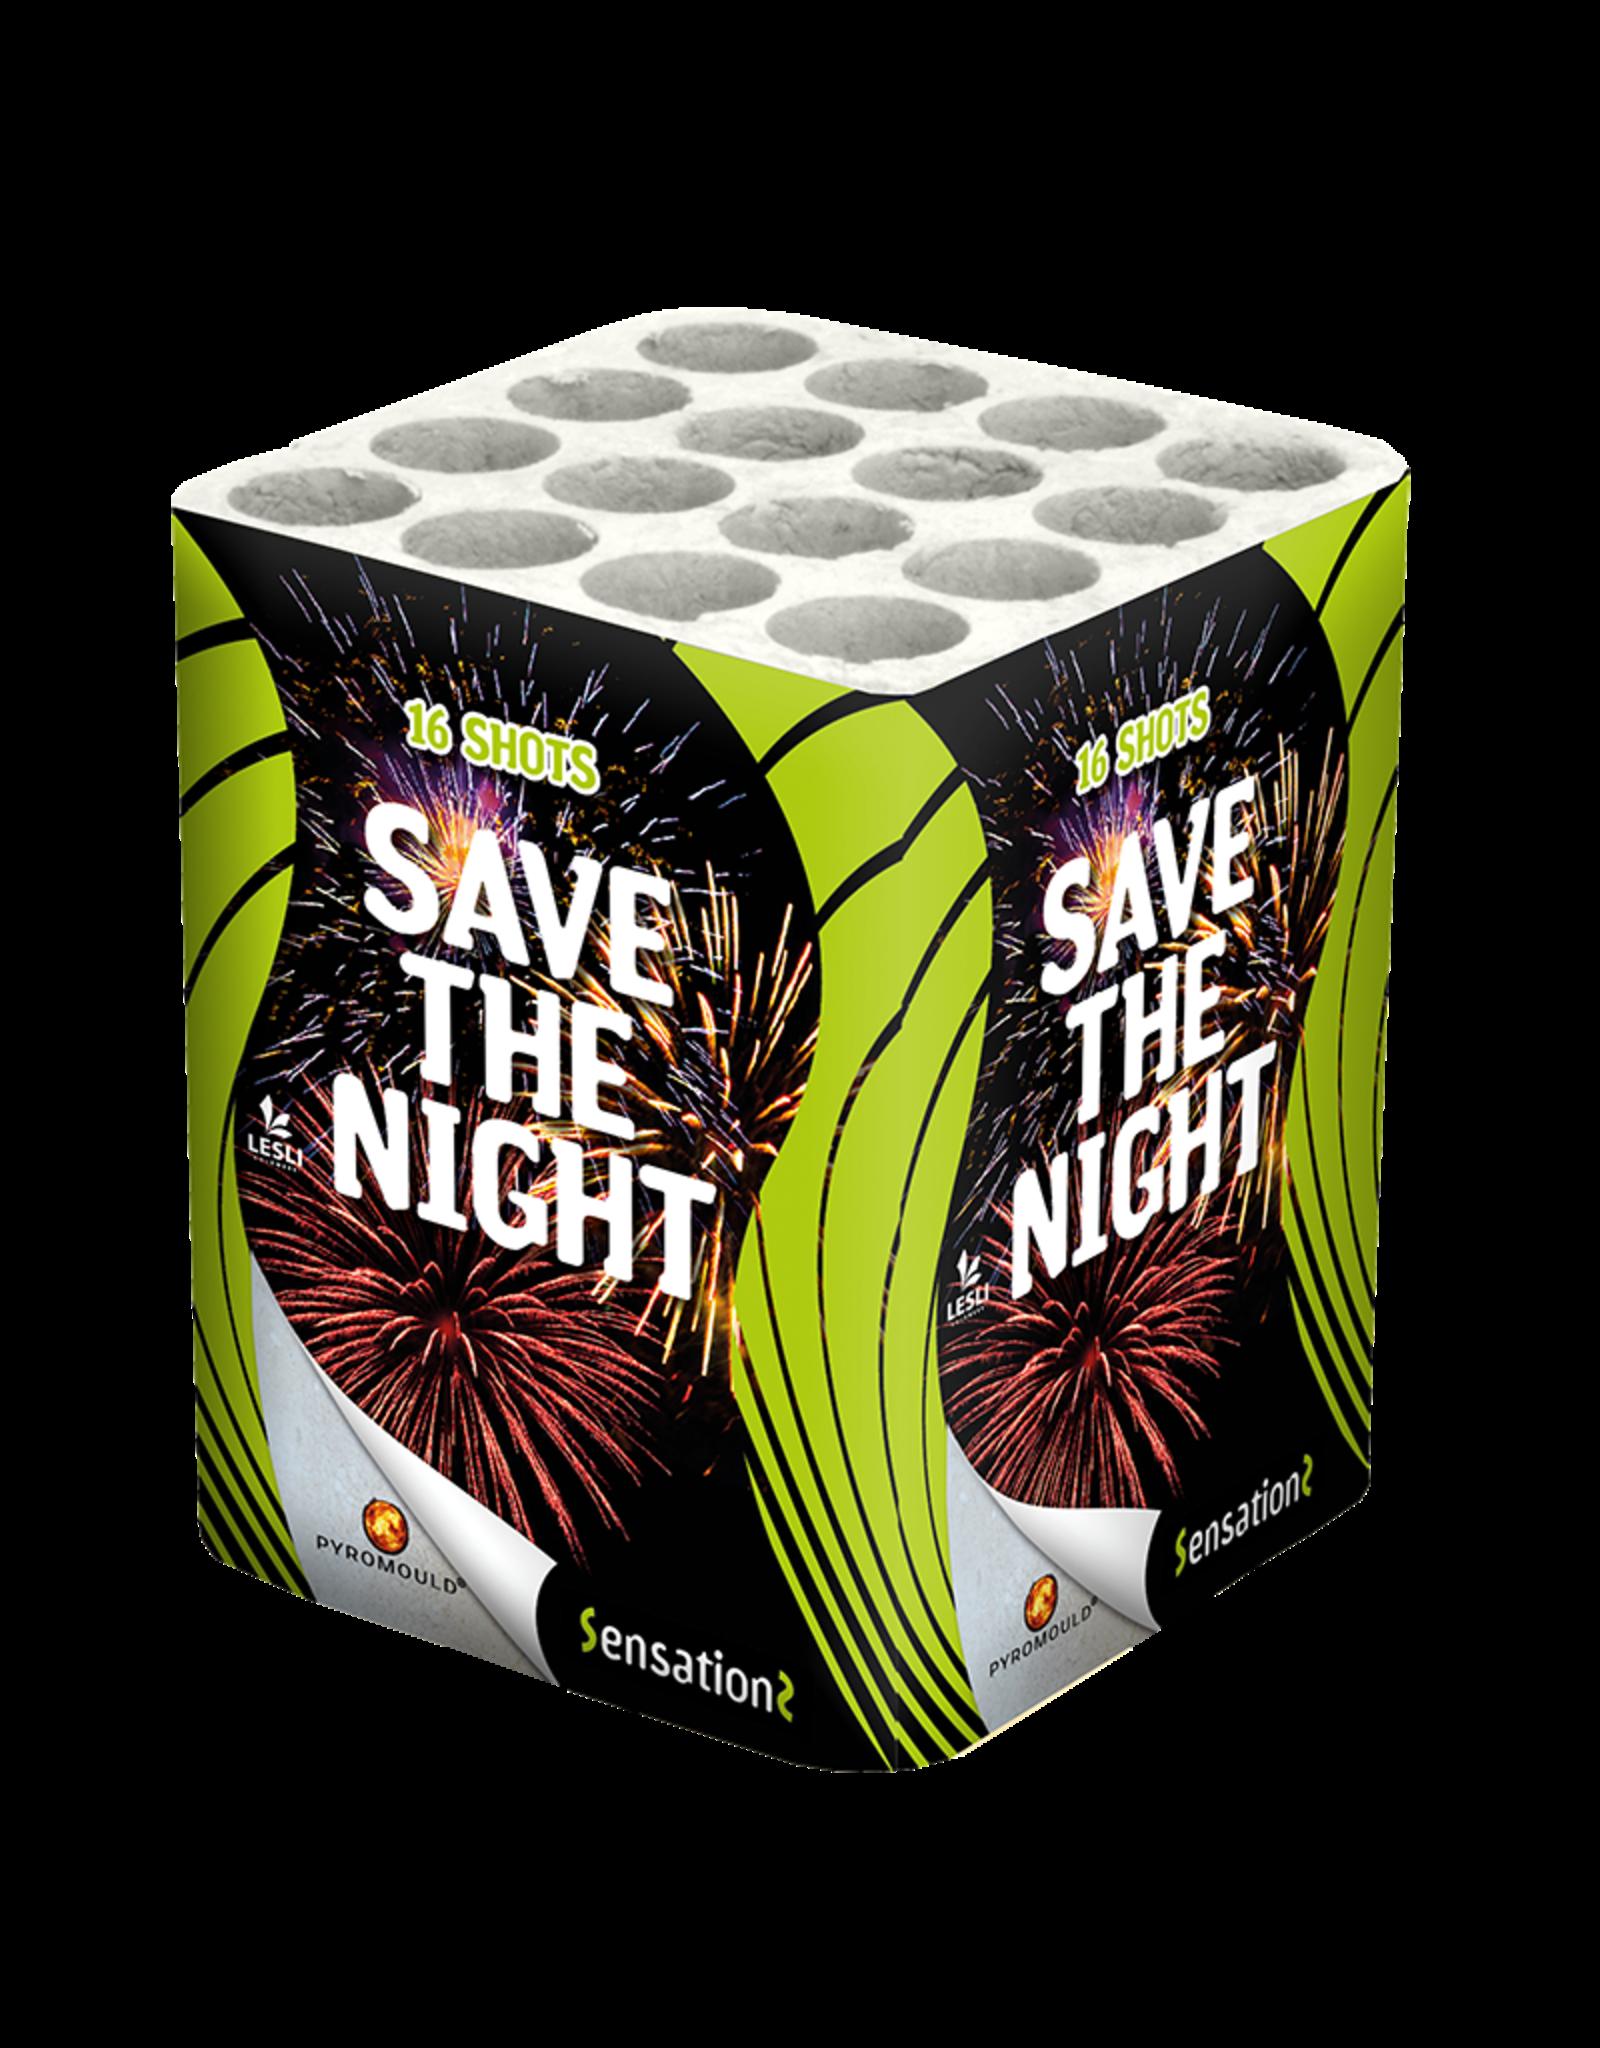 Lesli Vuurwerk Save the Night 16 shots